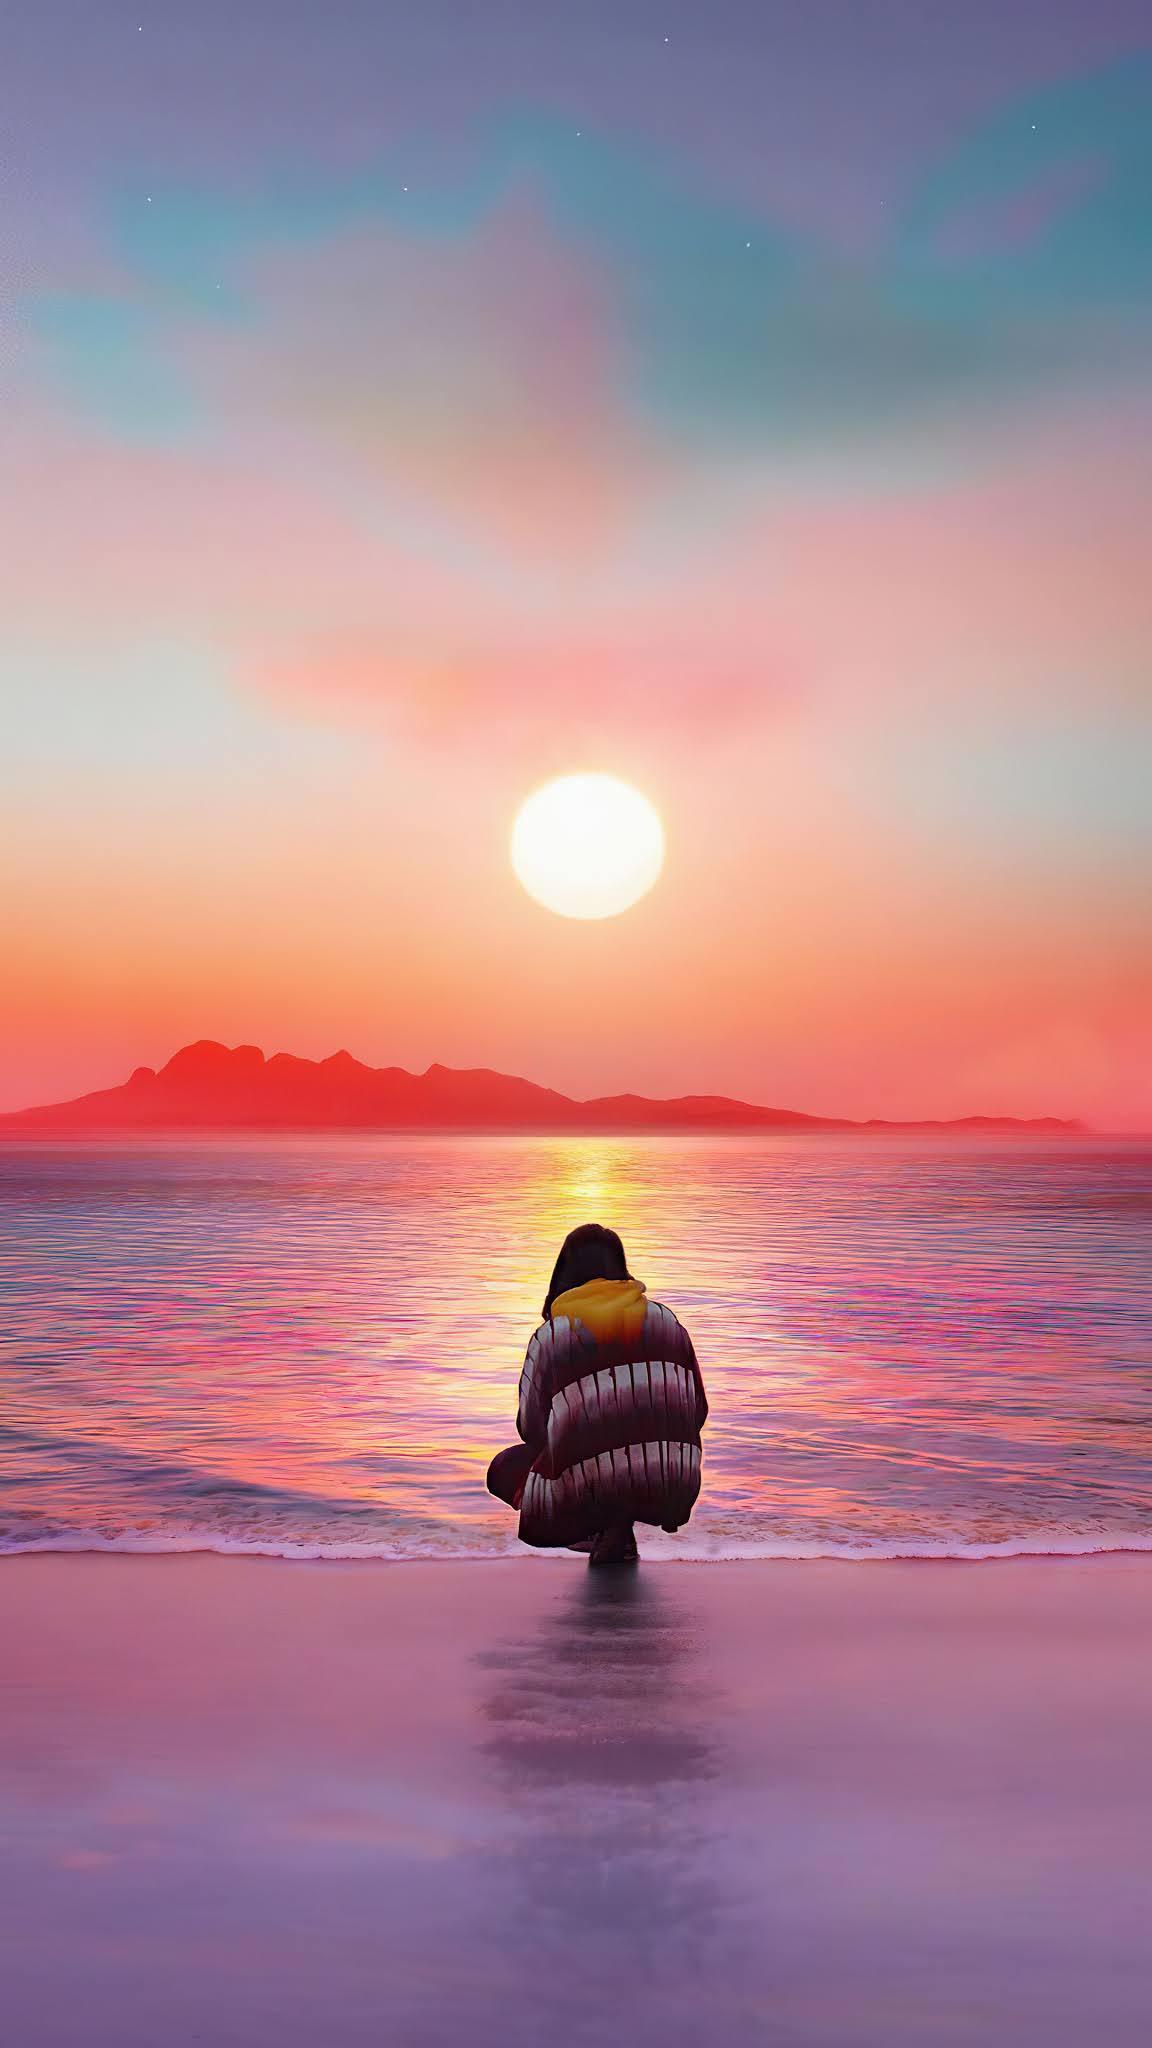 Sunset watching beach scenery mobile wallpaper